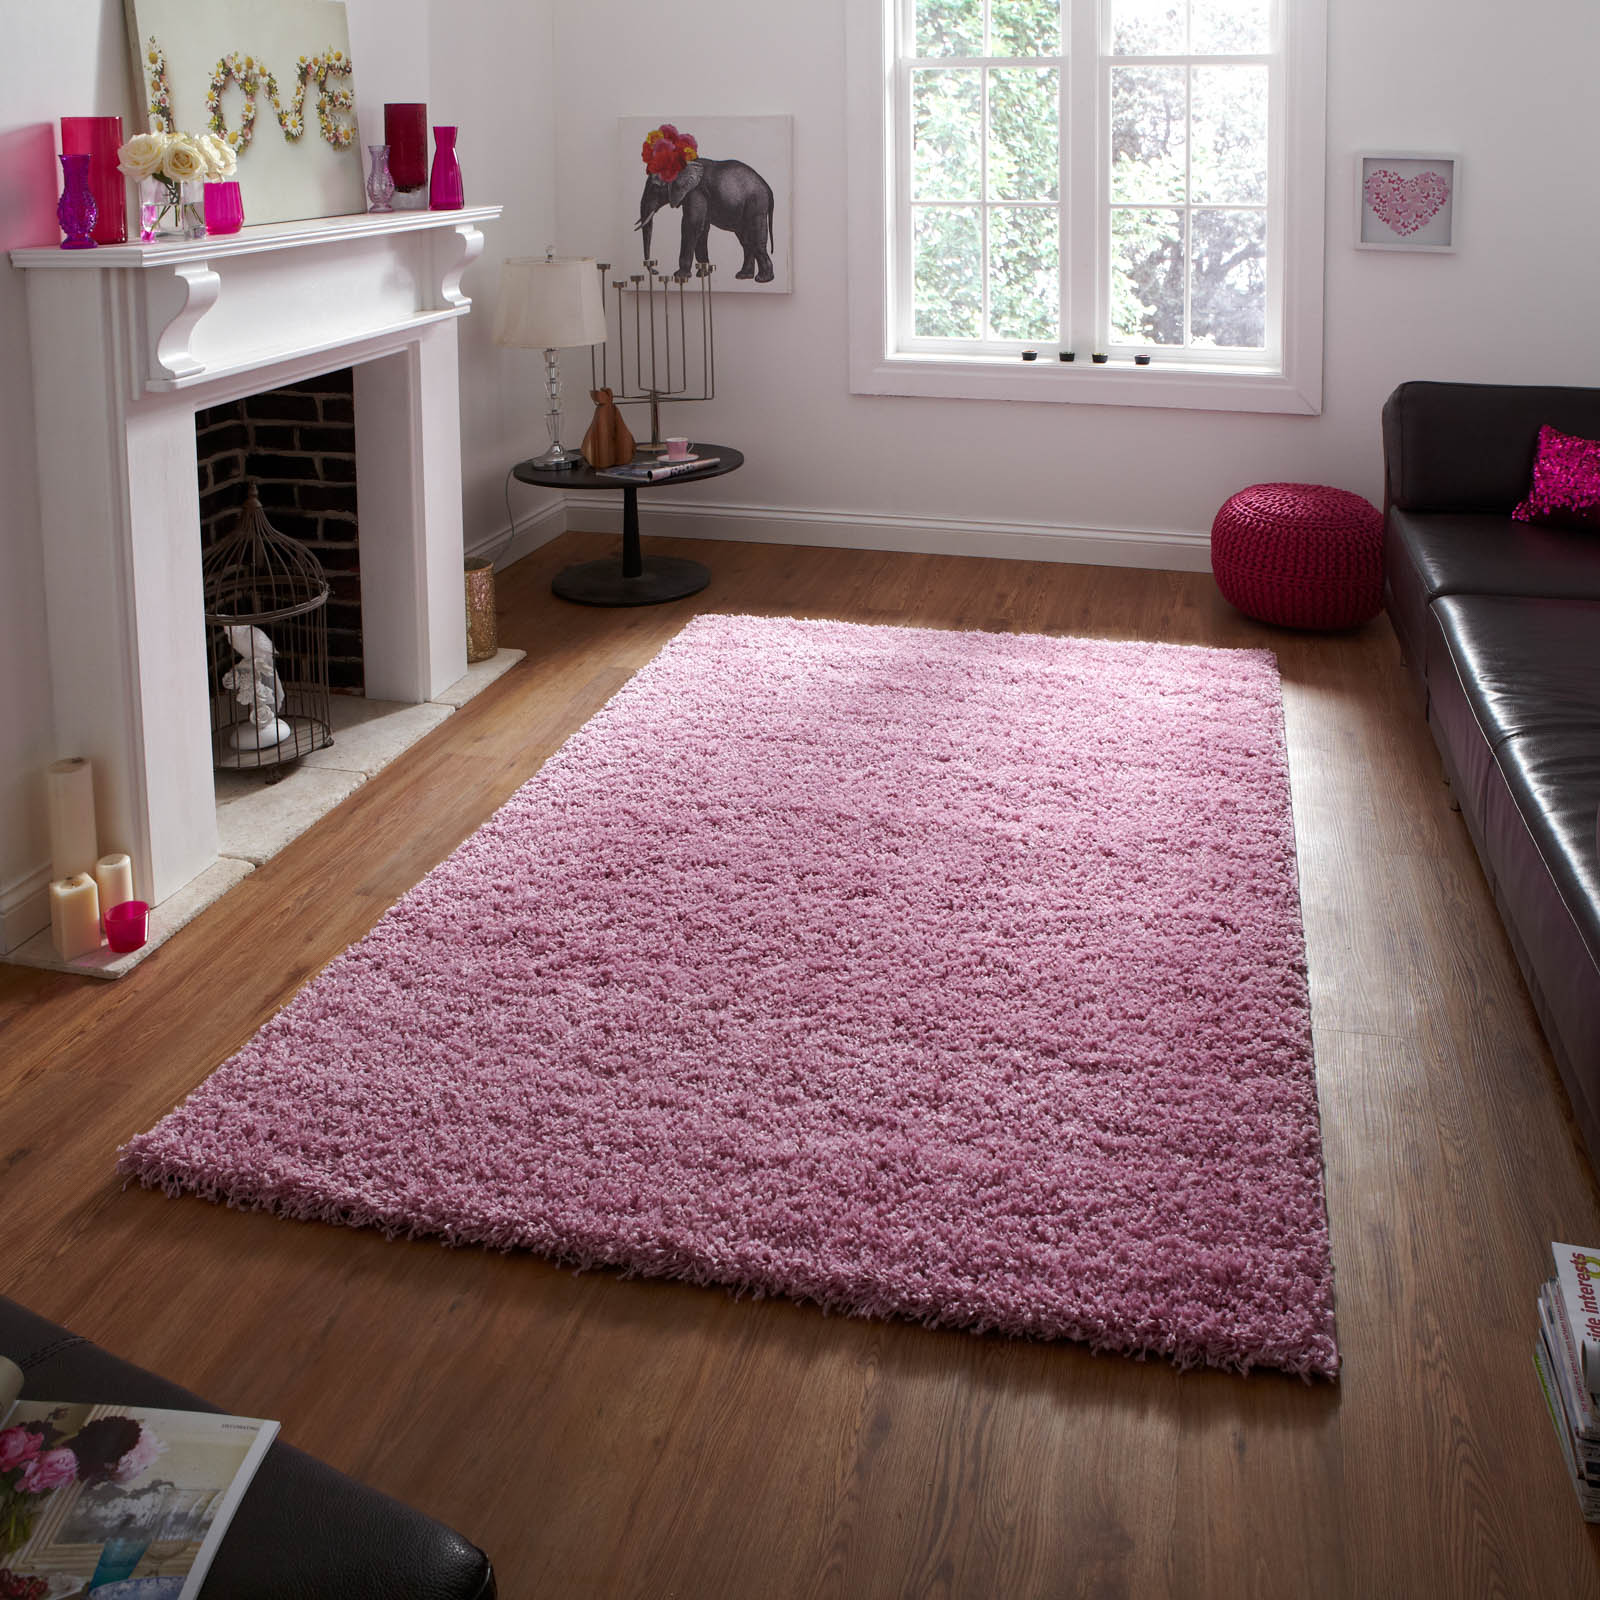 vista shaggy rugs - buy online for huge savings ZKWHBPI